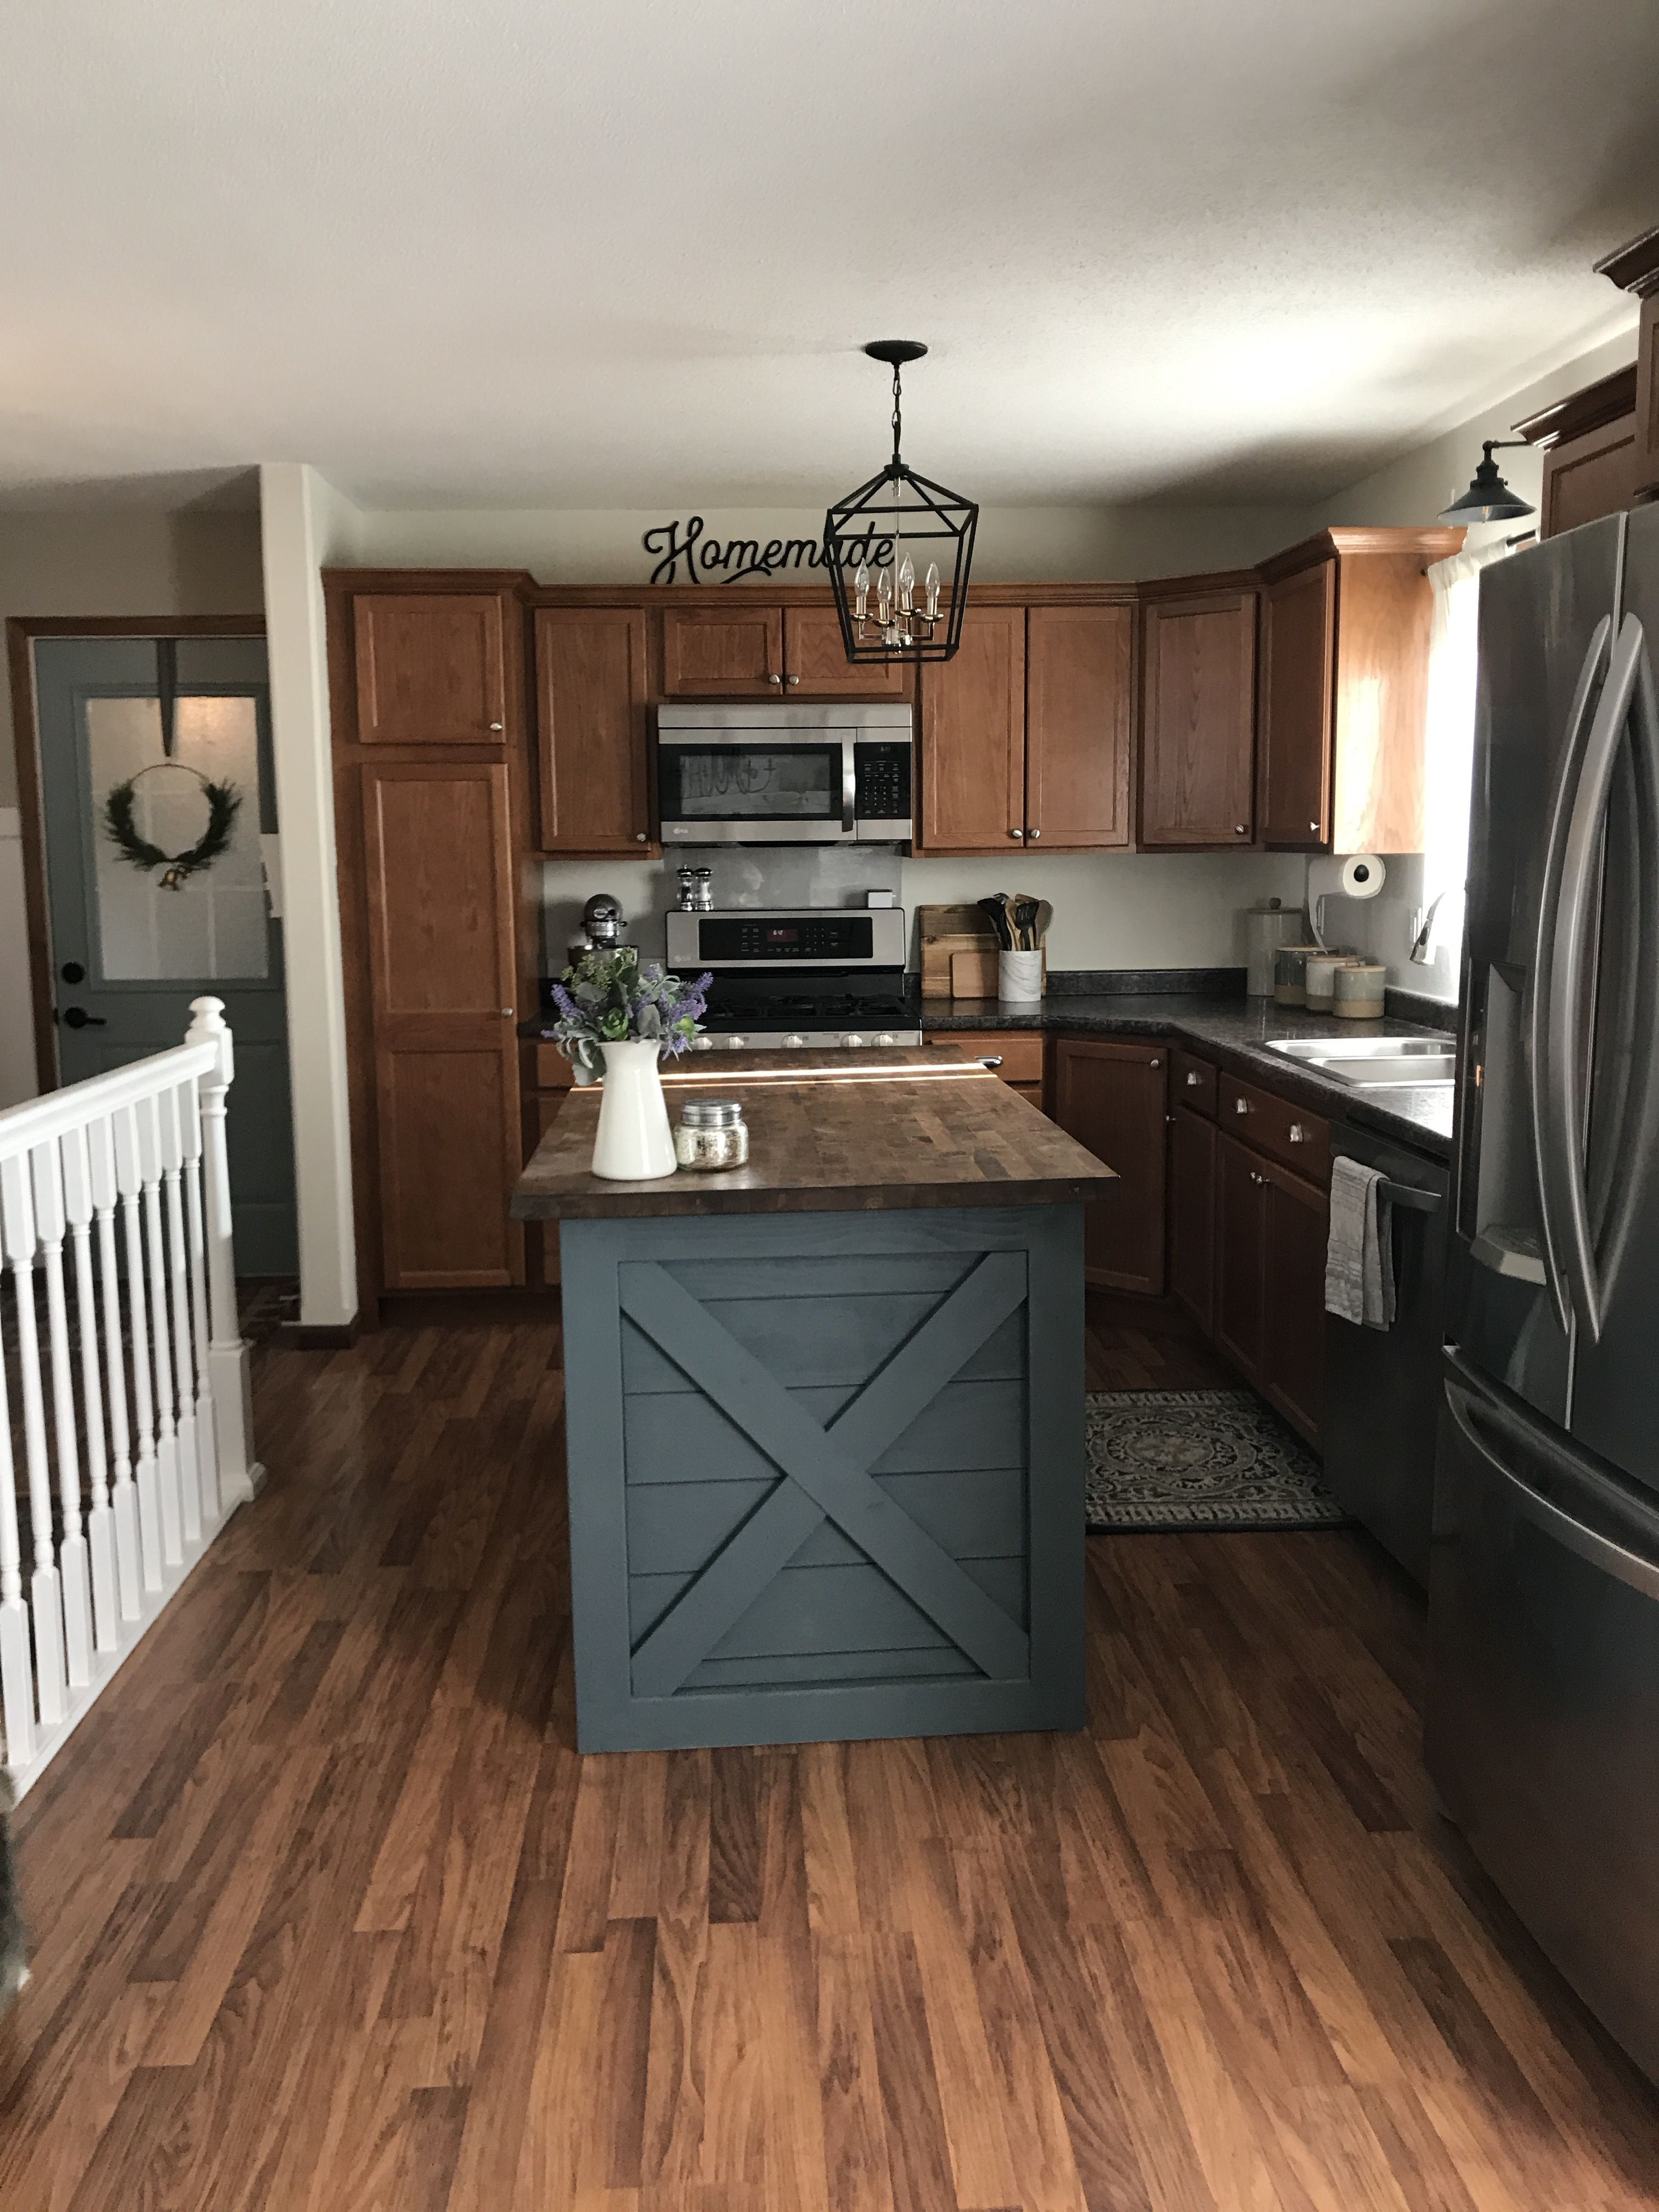 47 Inspiring Kitchen Island Ideas Up Style Extra Storage